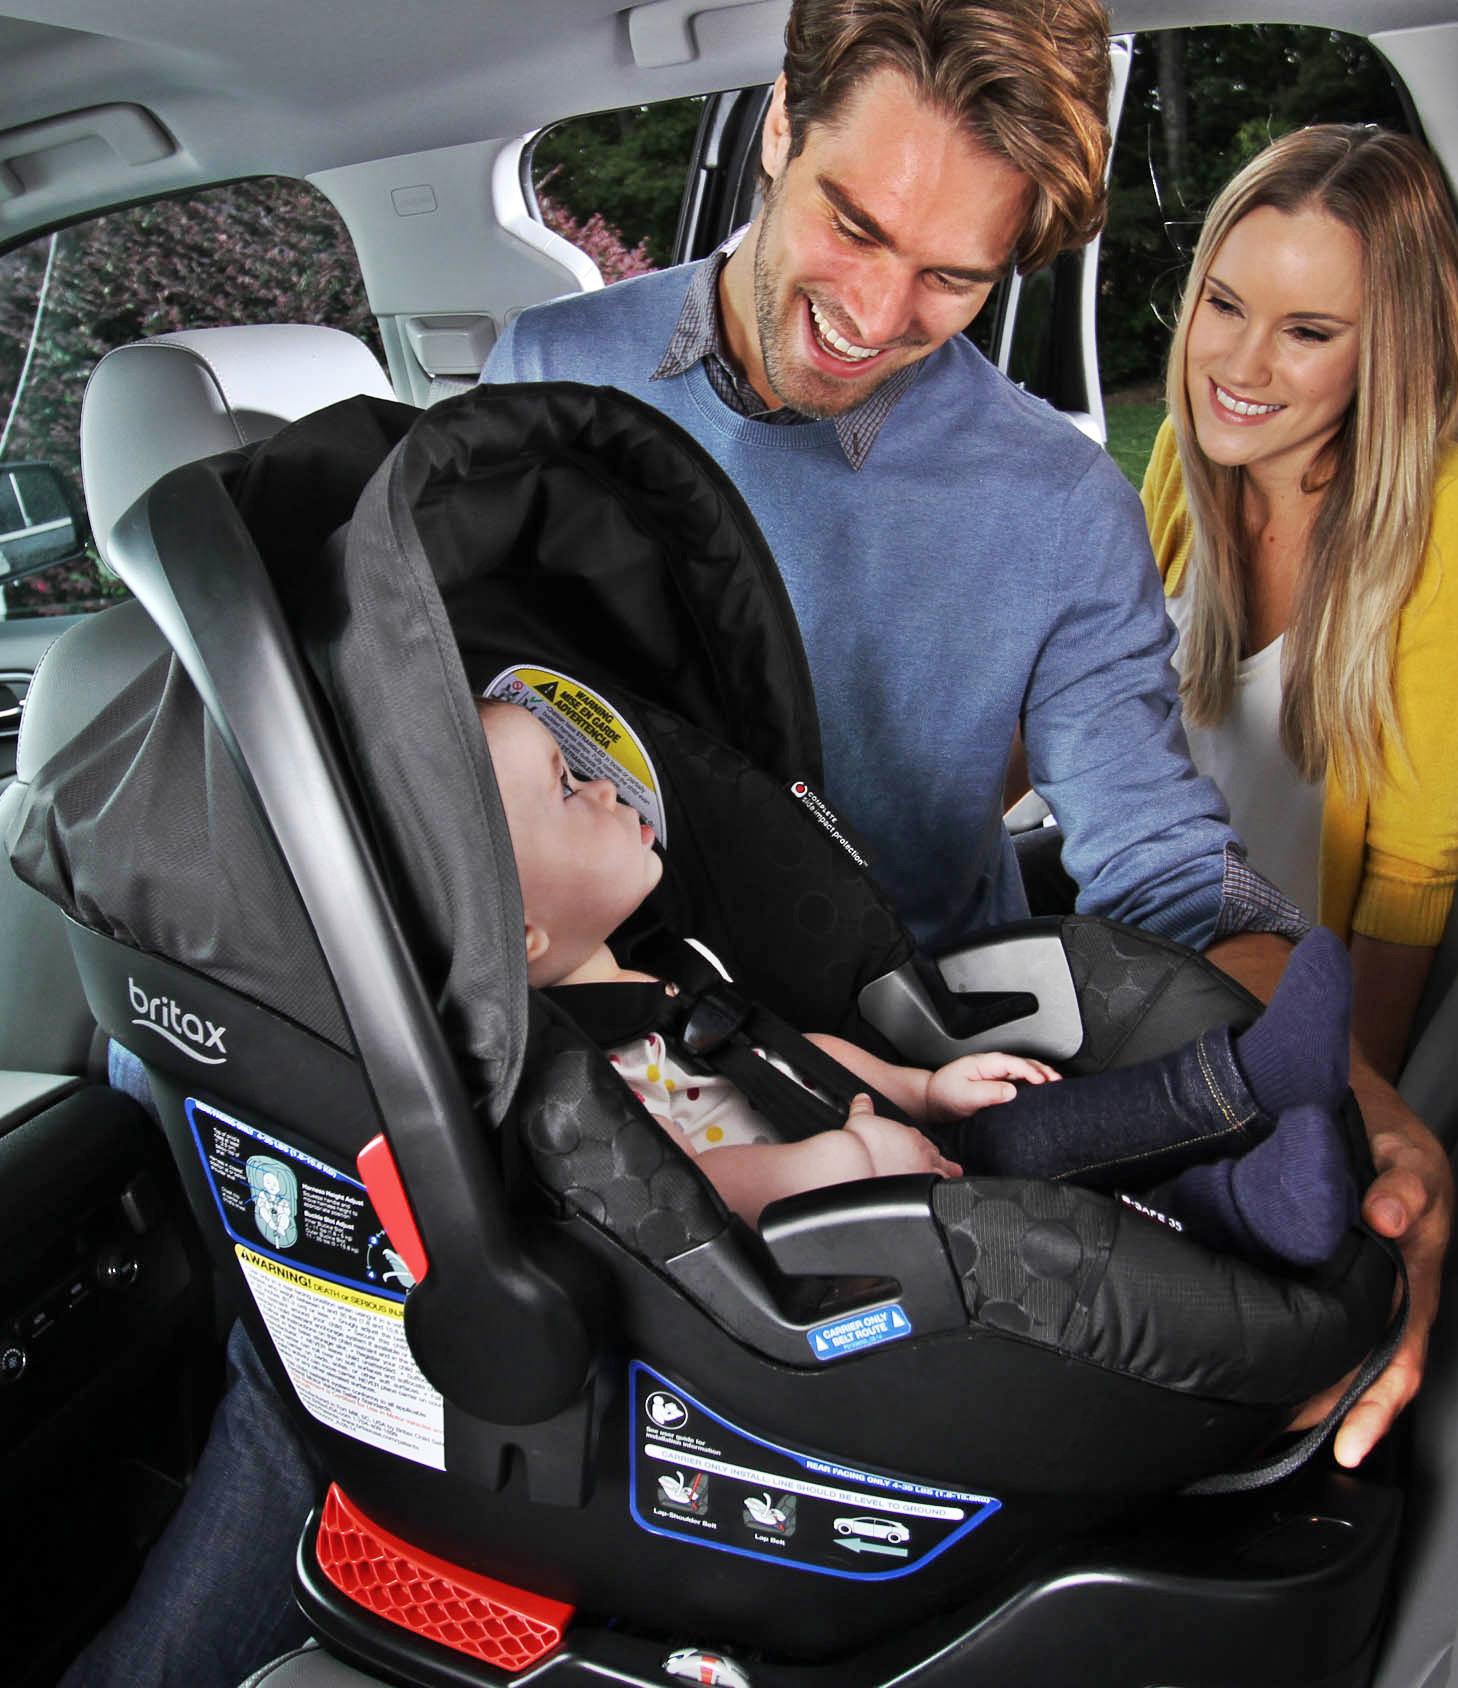 Britax Infant Car Seat Weight Limit Rear Facing